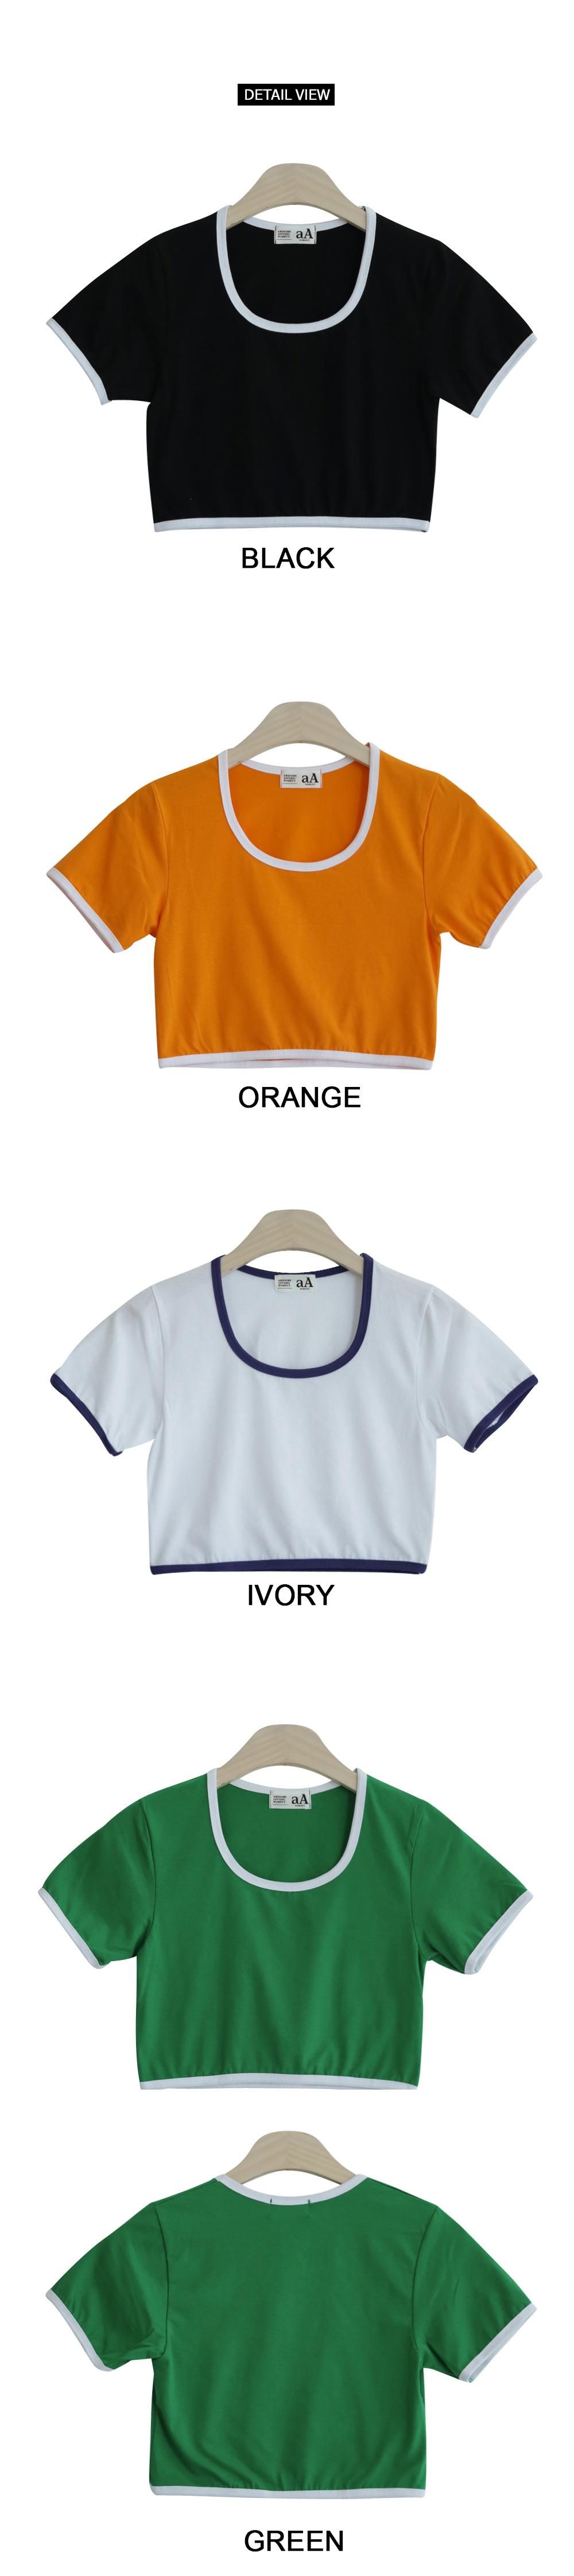 Color Rabpa T-shirt